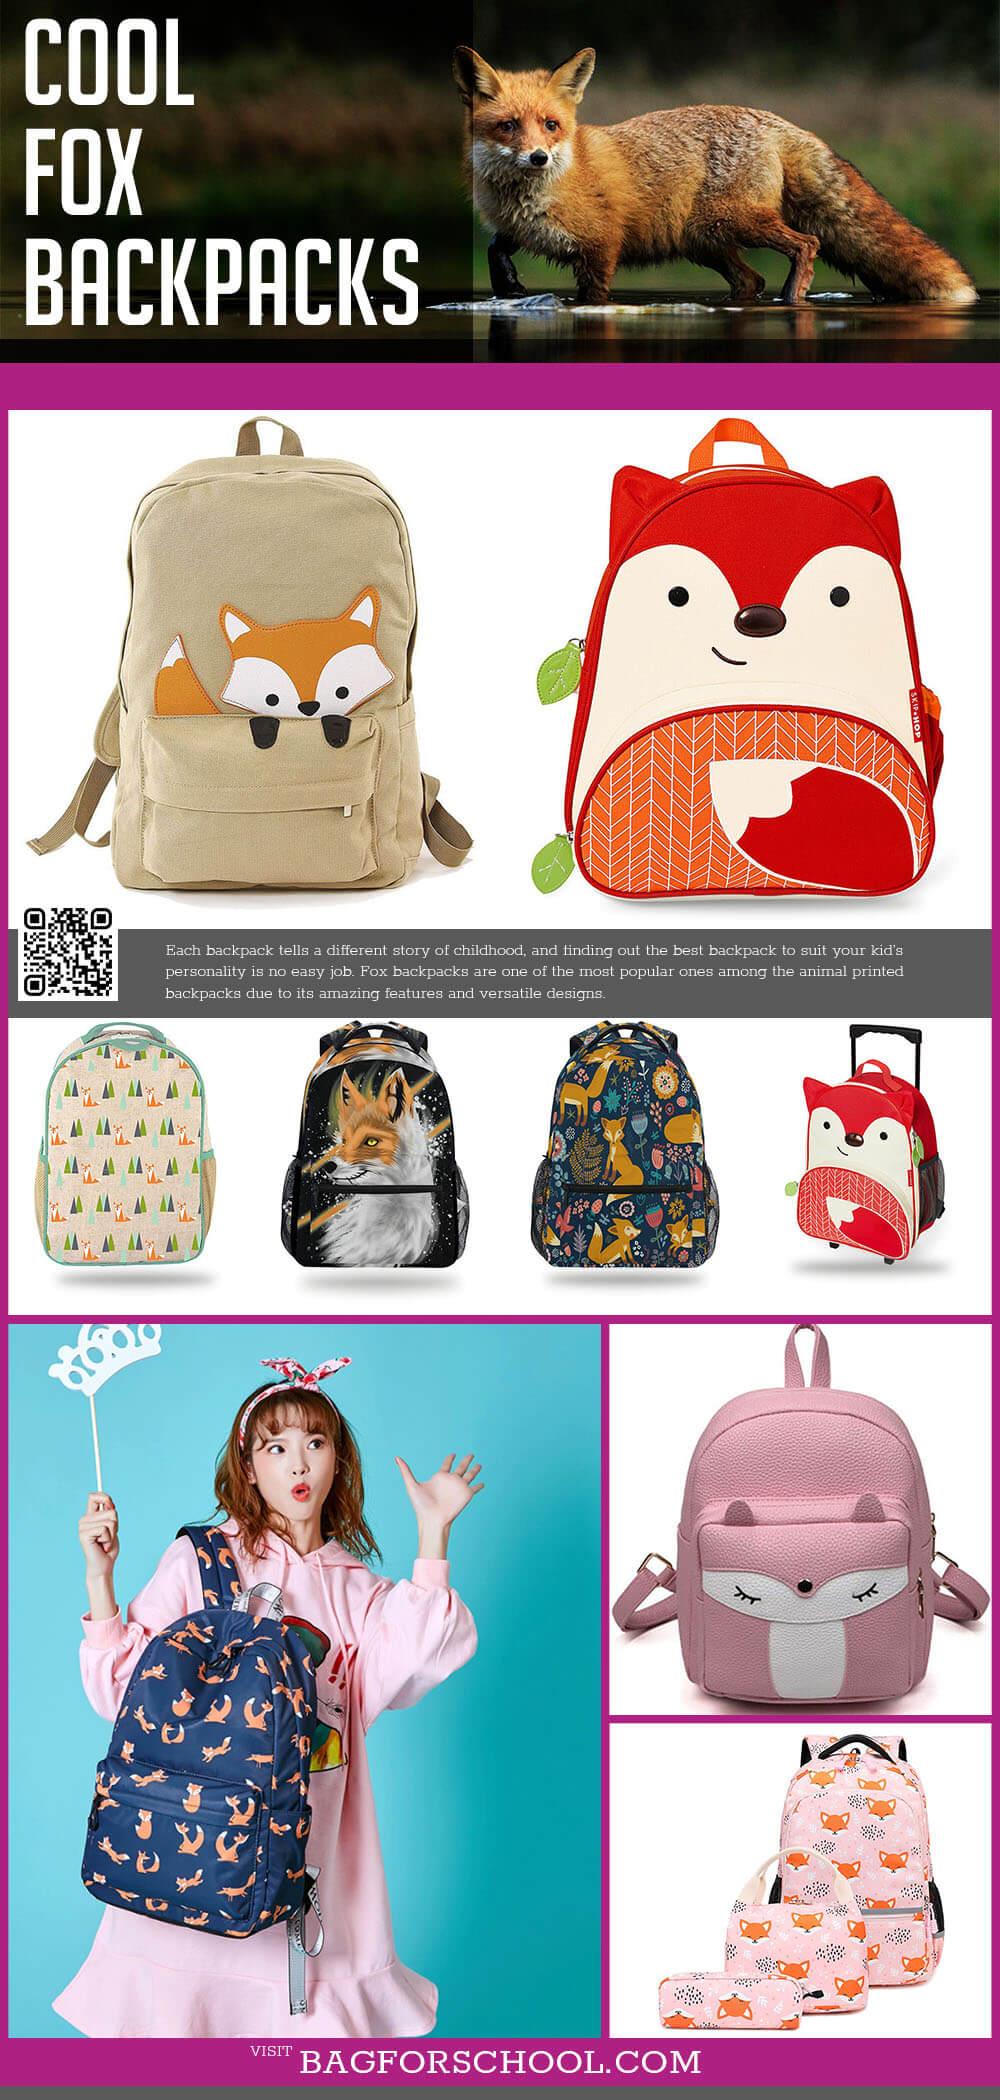 Fox Backpacks